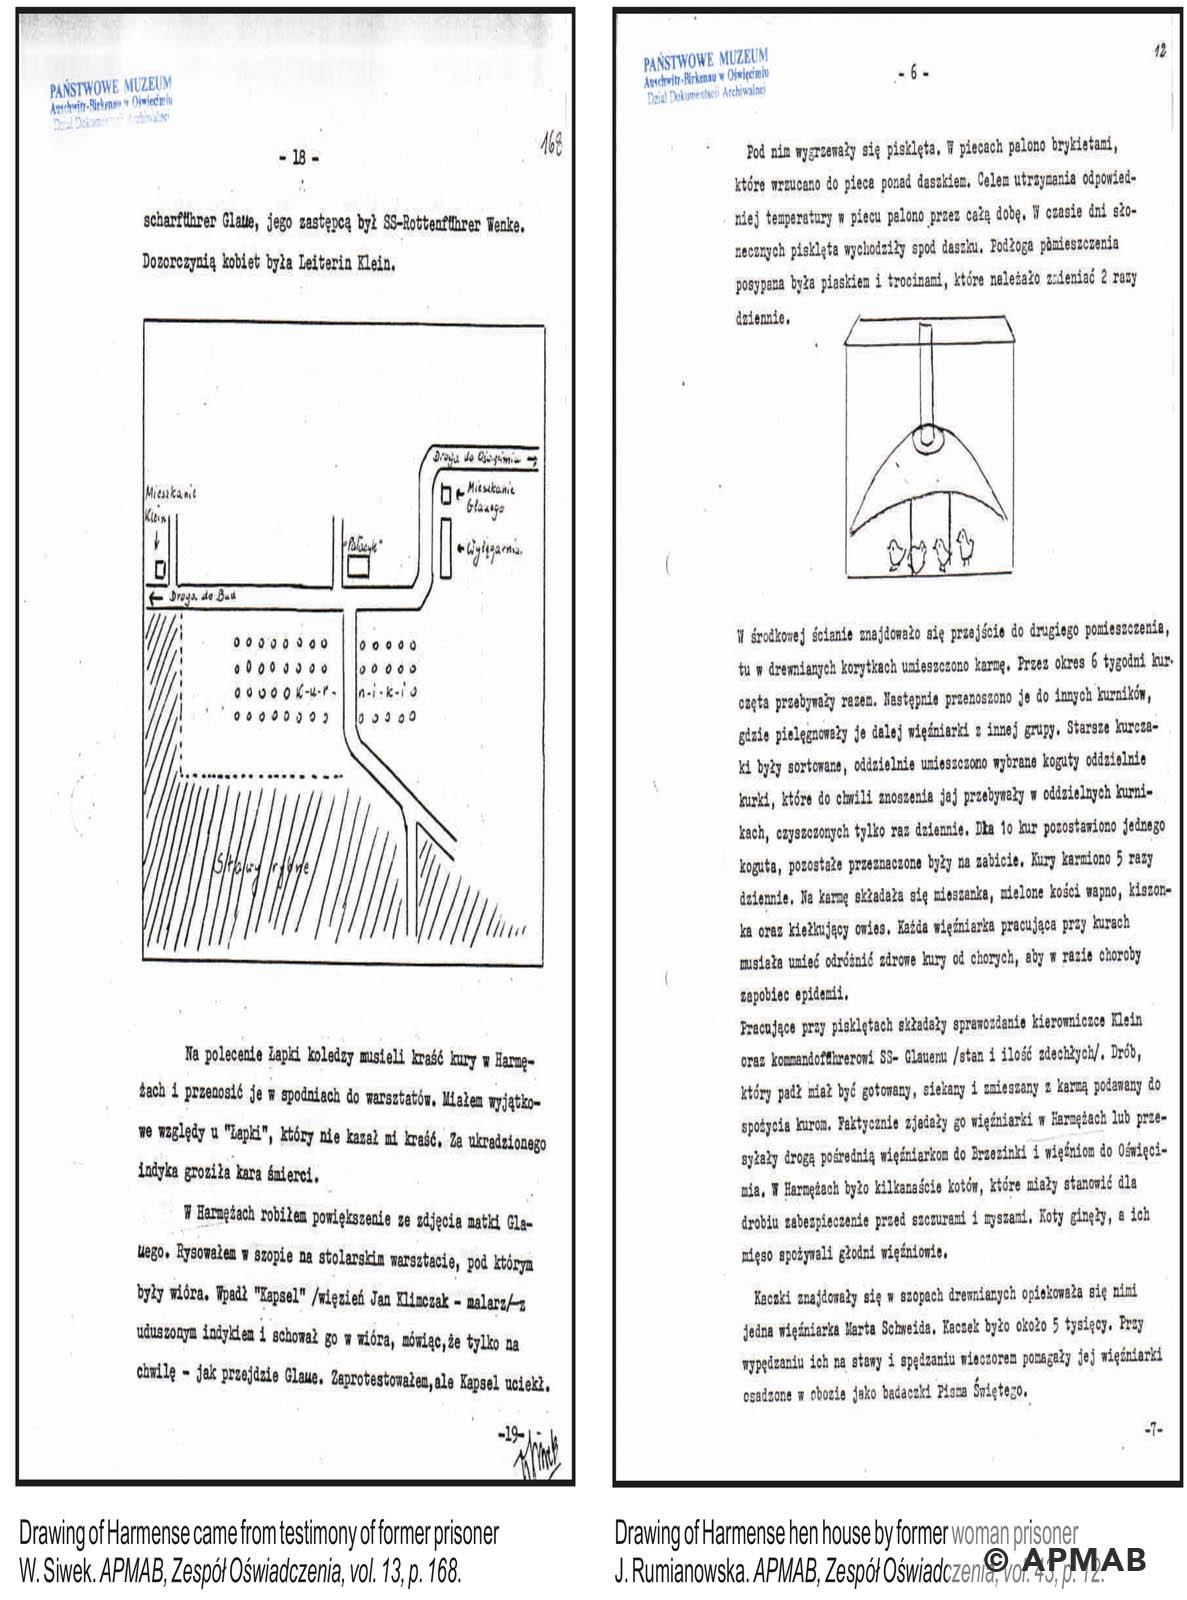 Former Prisoner drawings of Harmense sub camp. APMAB